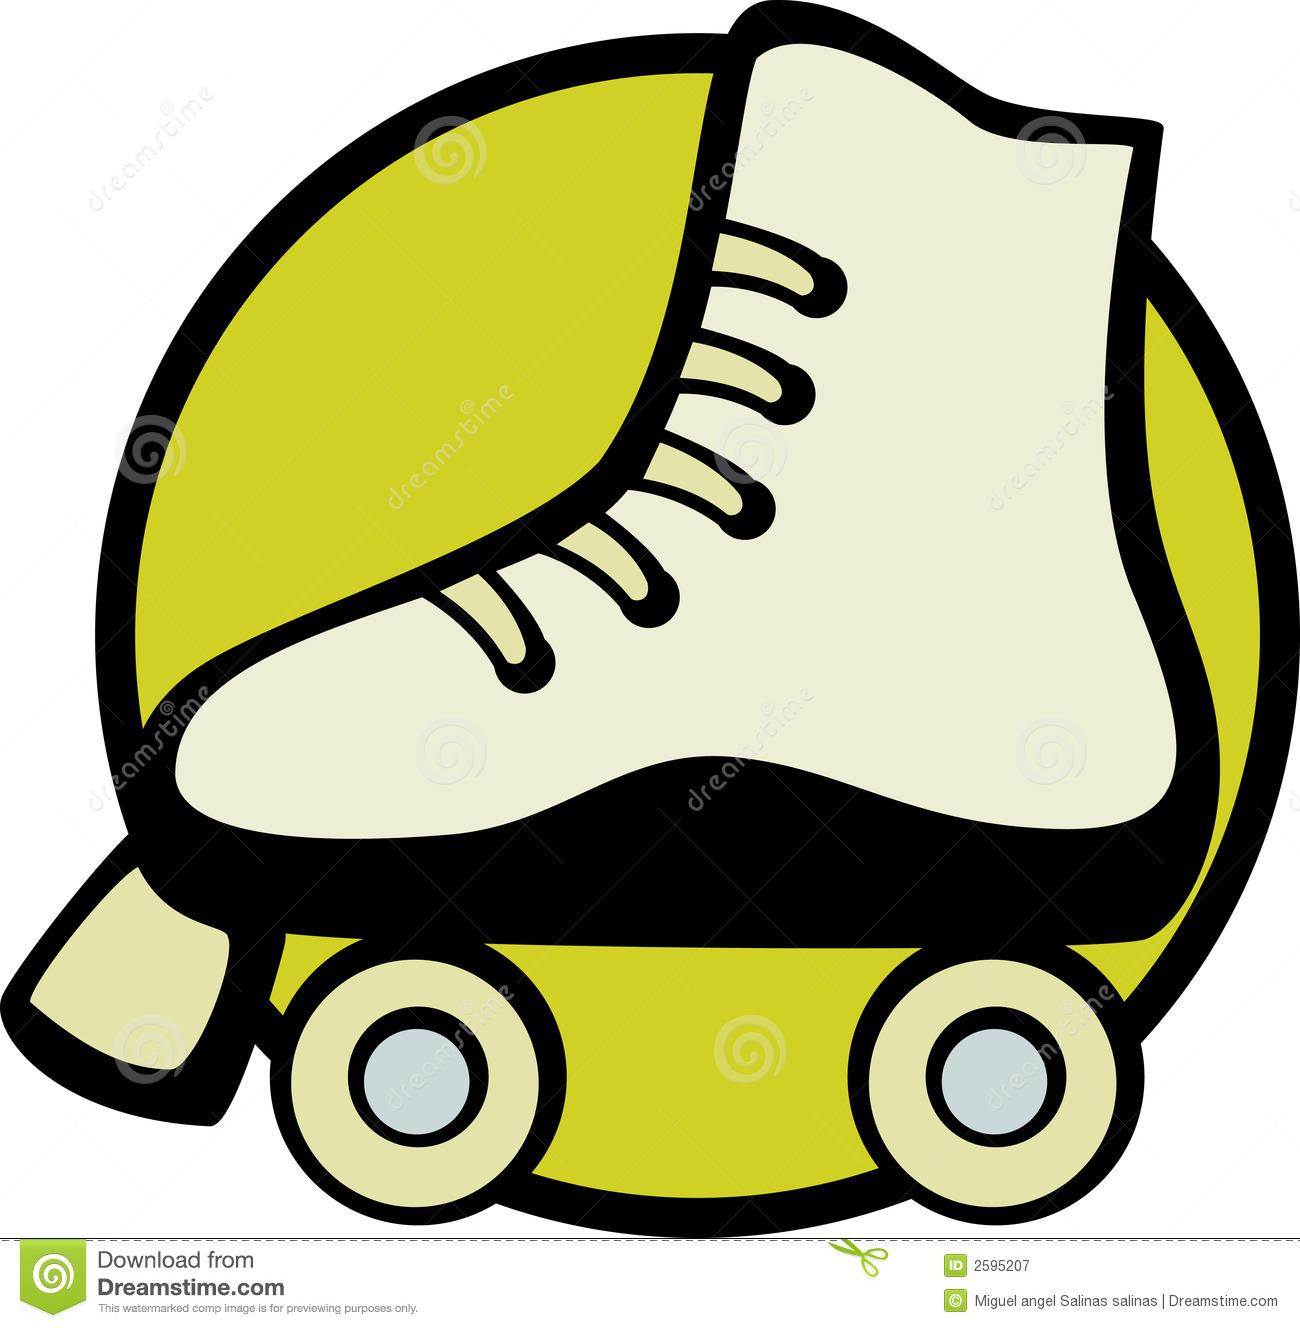 Roller Skate Vector Illustration Royalty-Roller skate vector illustration Royalty Free Stock Photography-16